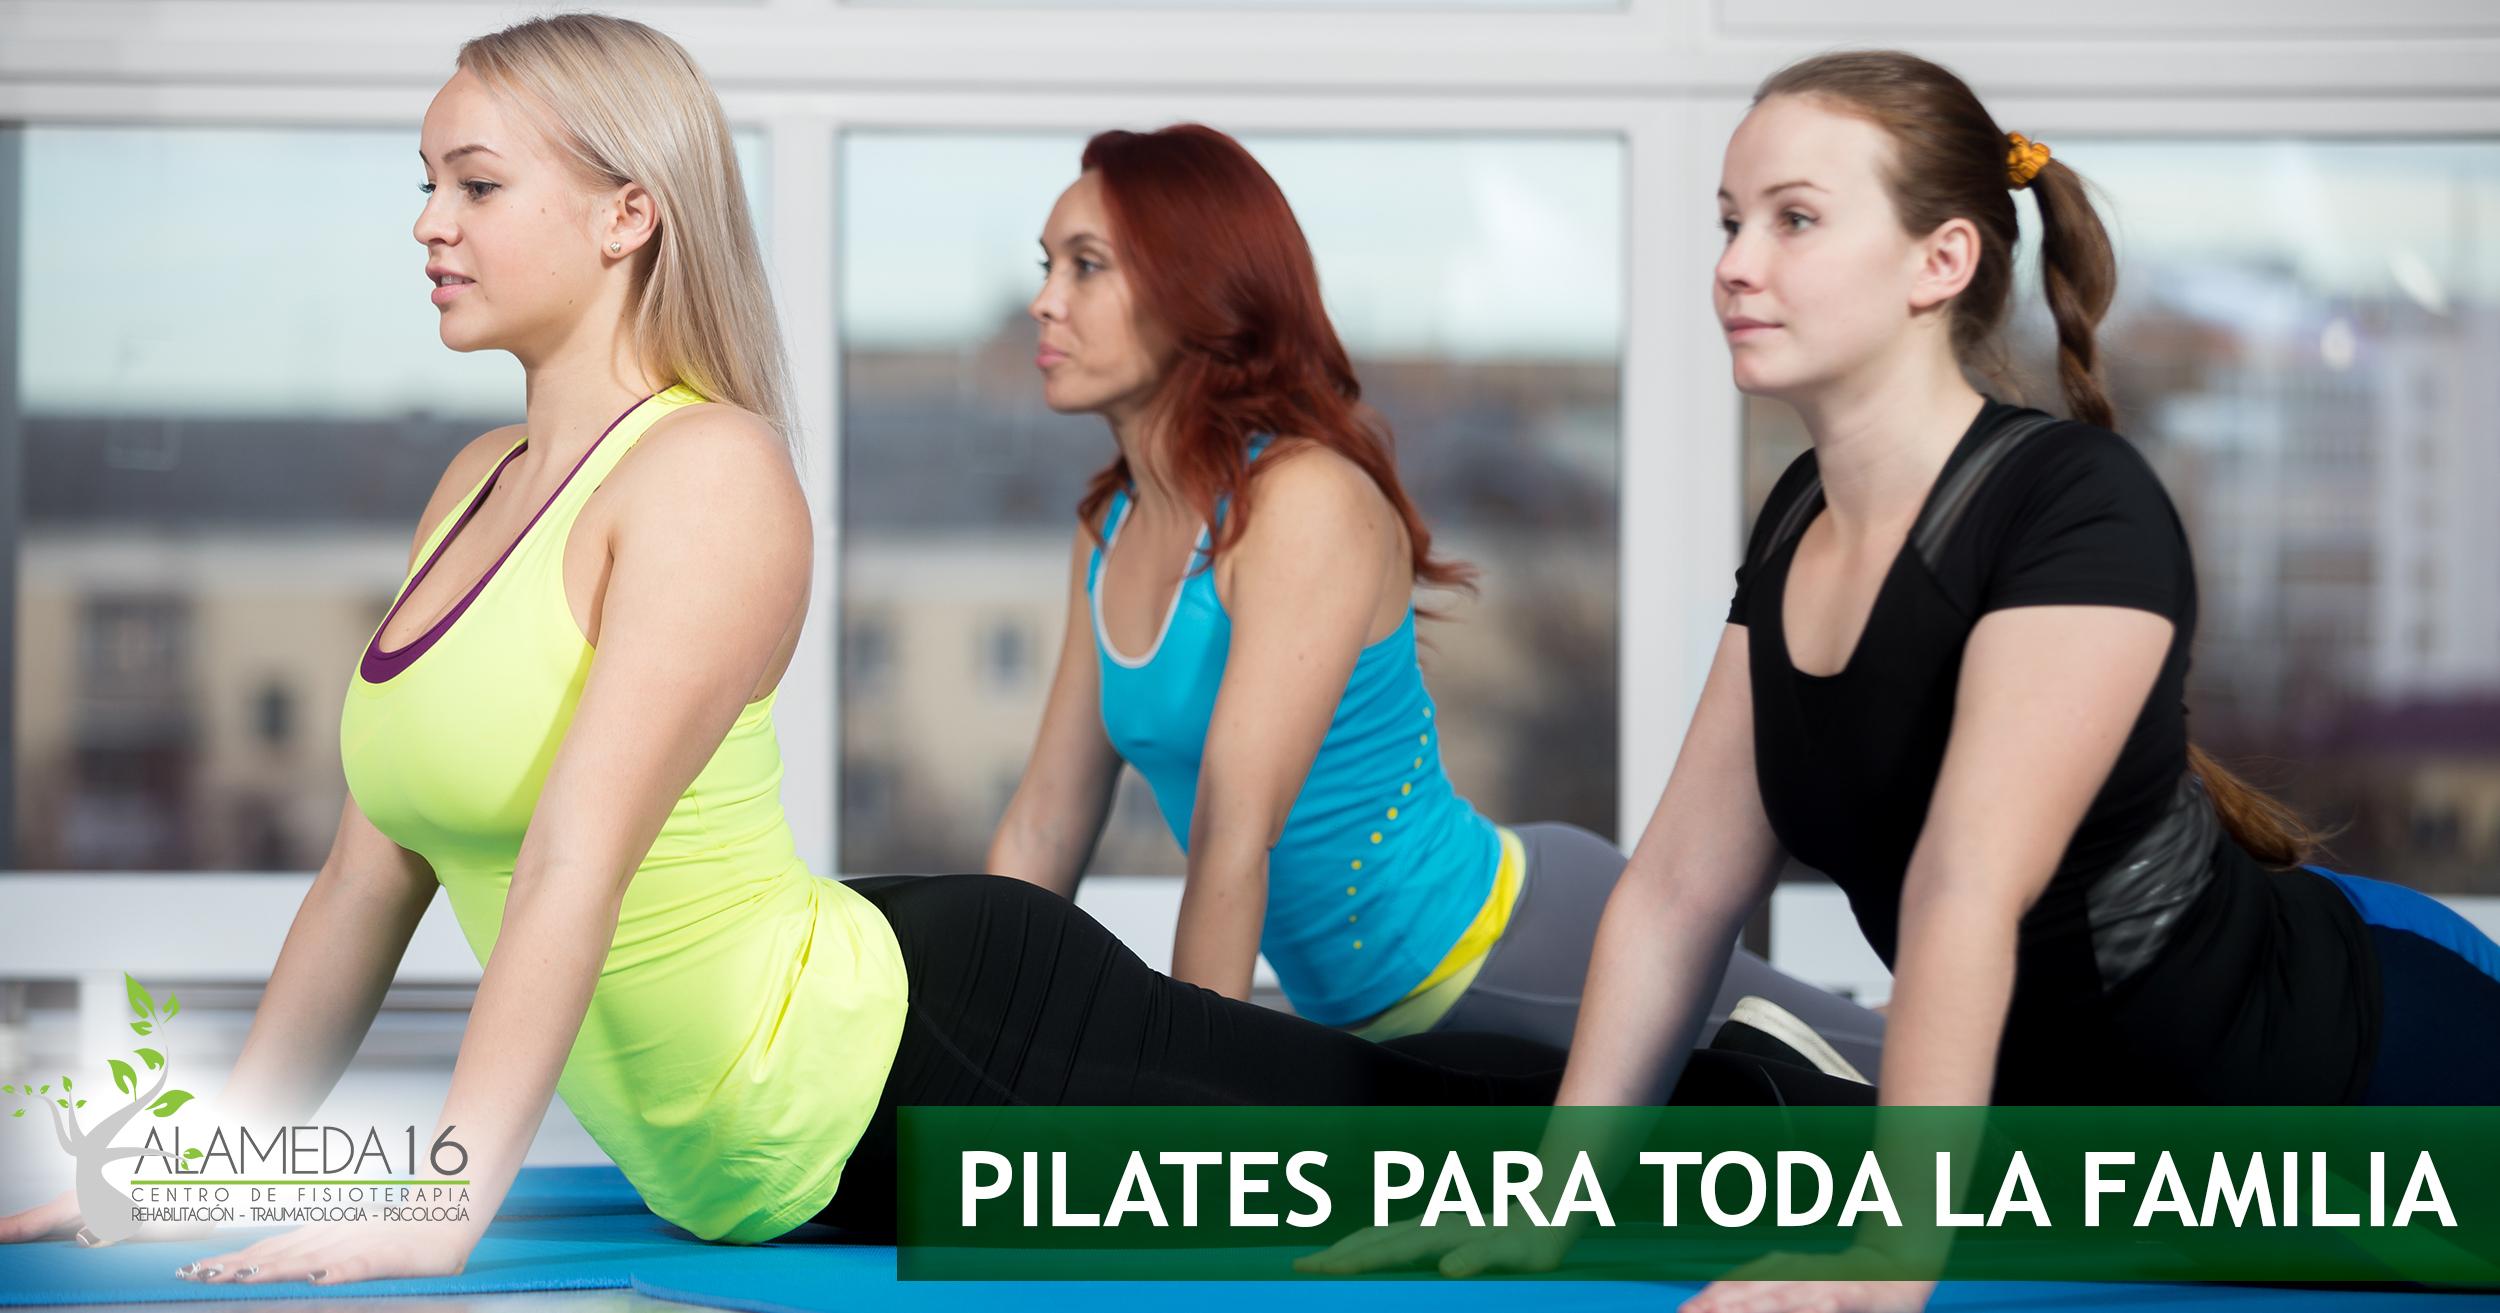 ¡Pilates para toda la familia!